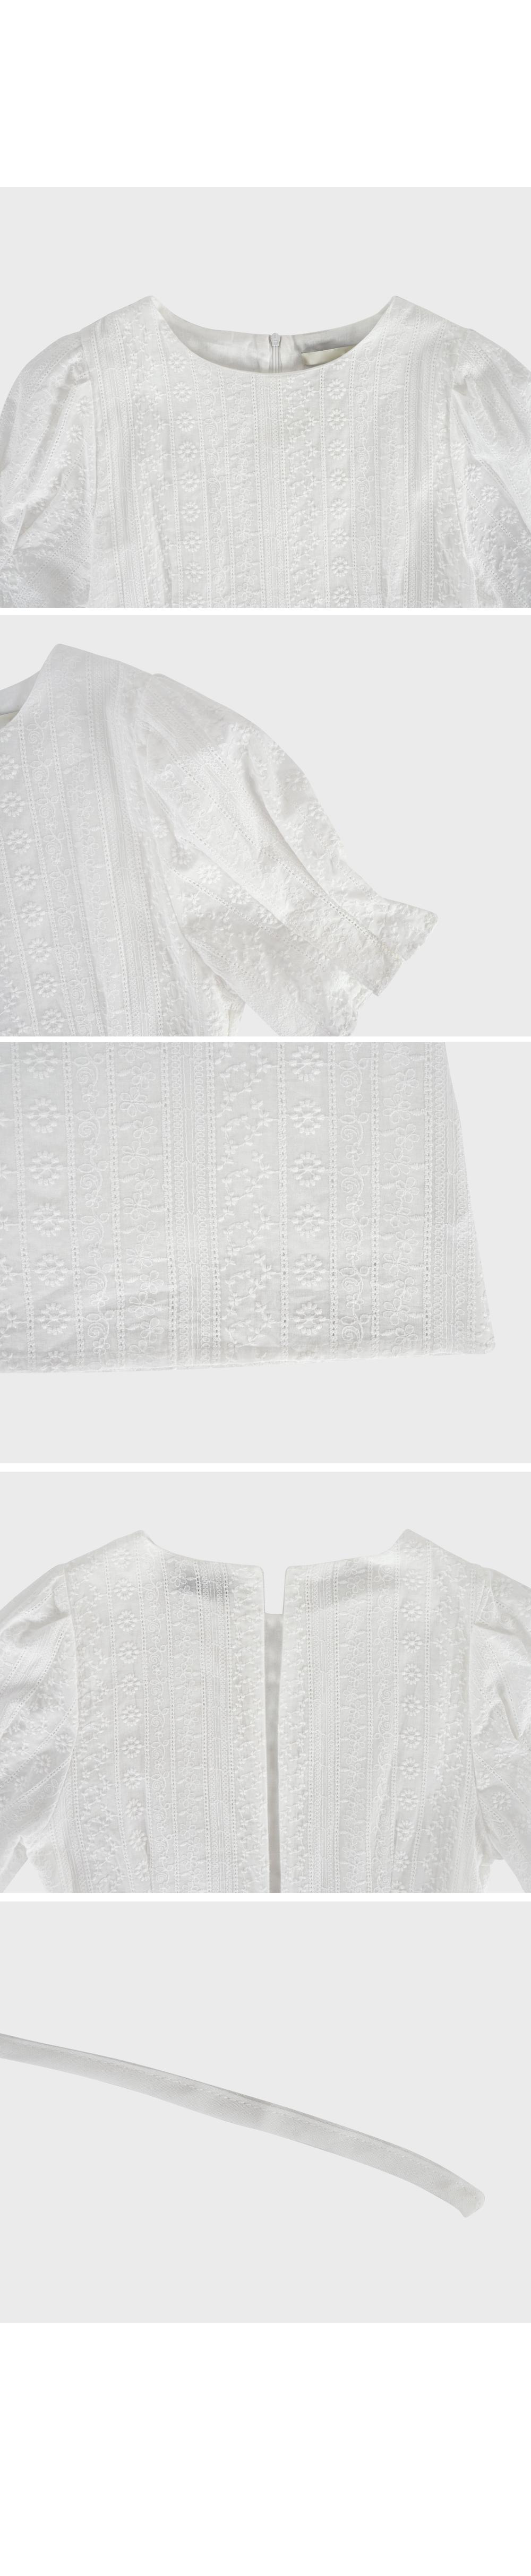 Embroidery White Mini Dress- Holiholic